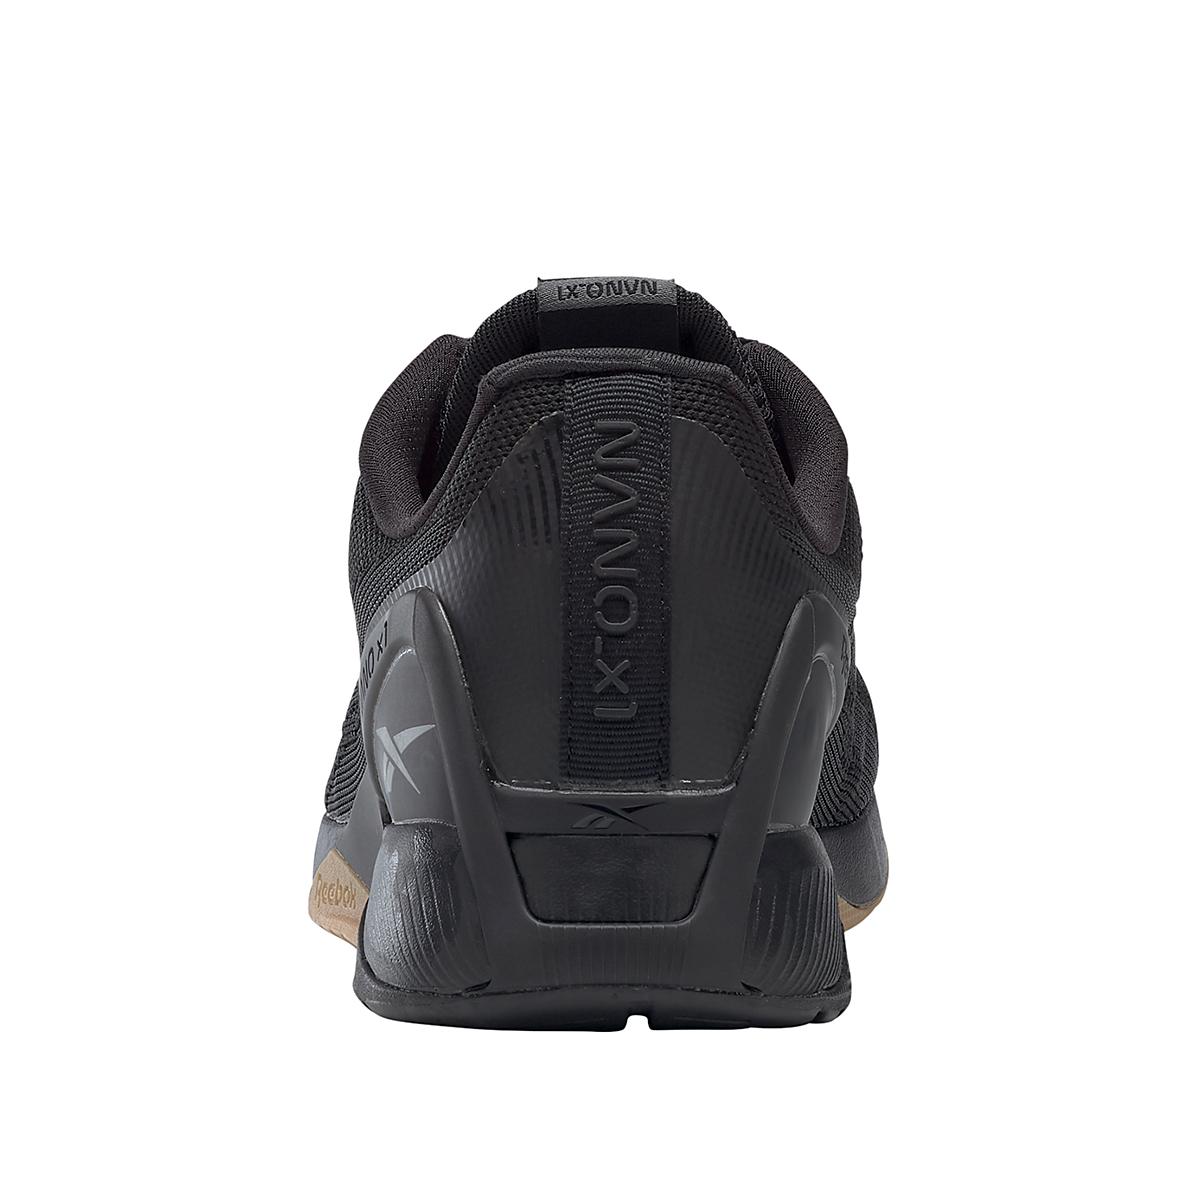 Men's Reebok Nano X1 Training Shoe - Color: Black/Night Black/Rubber Gum - Size: 6.5 - Width: Regular, Black/Night Black/Rubber Gum, large, image 6